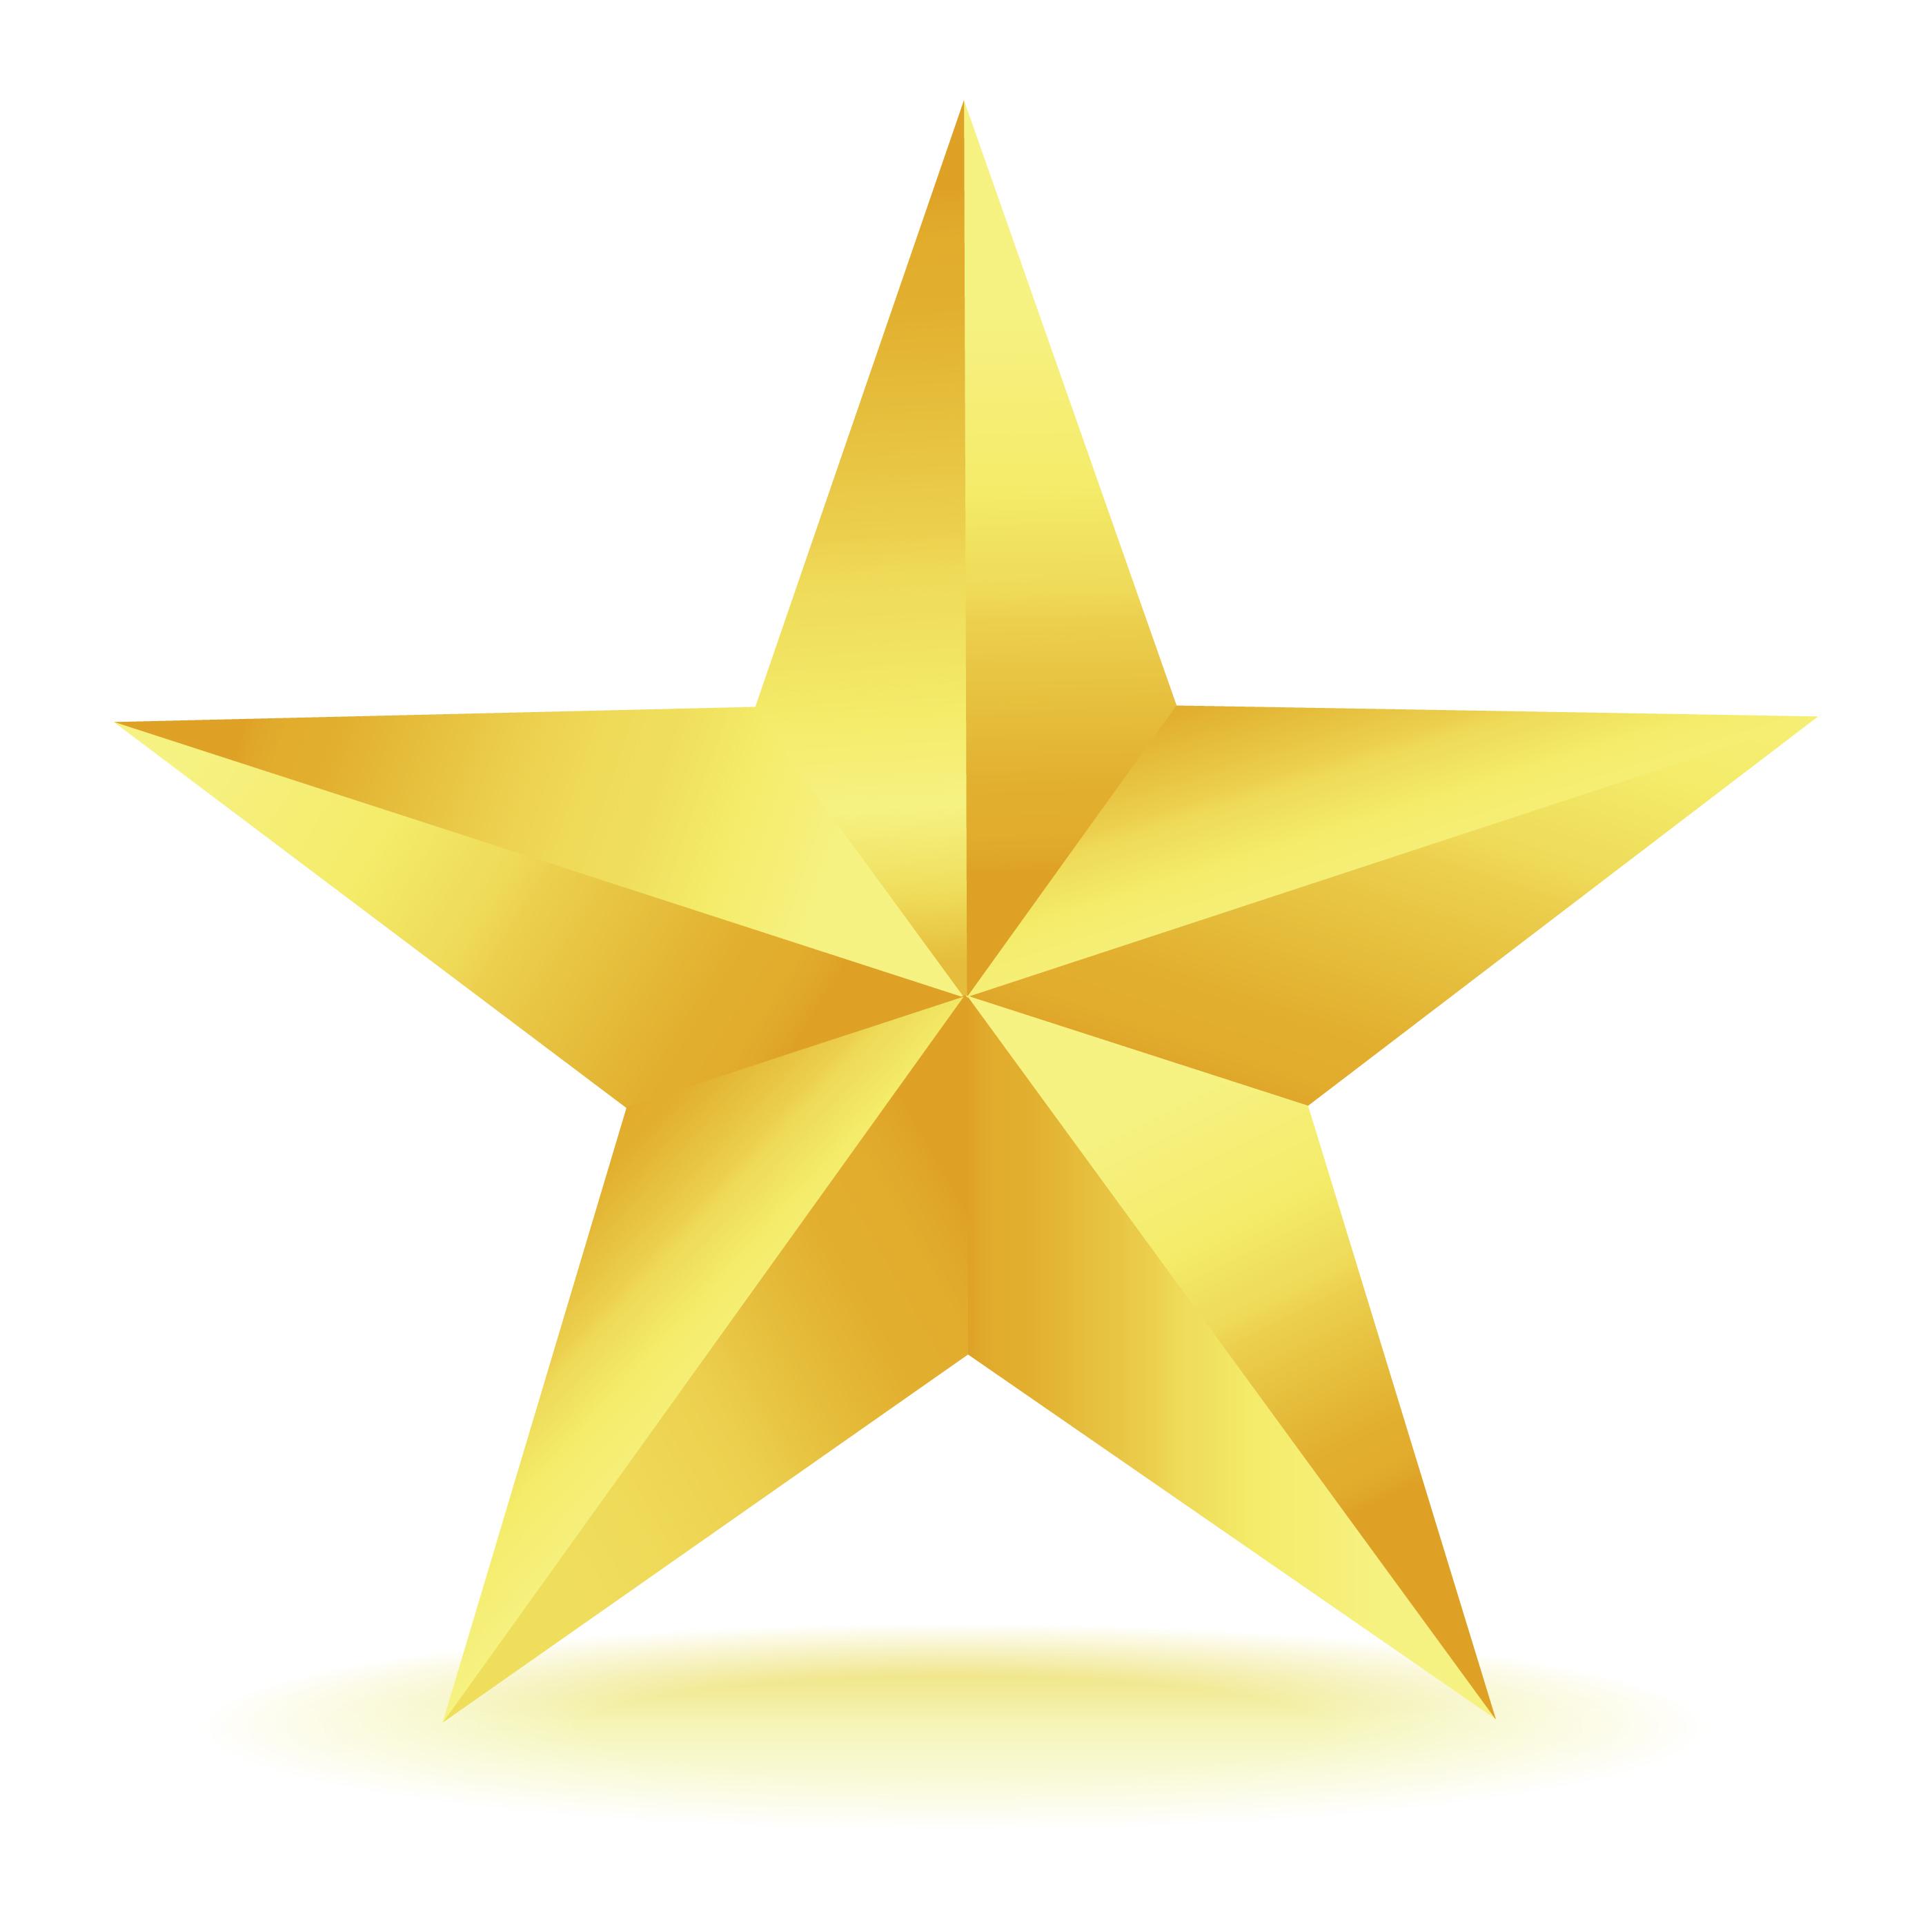 2800x2800 Gold Star Images Clip Art